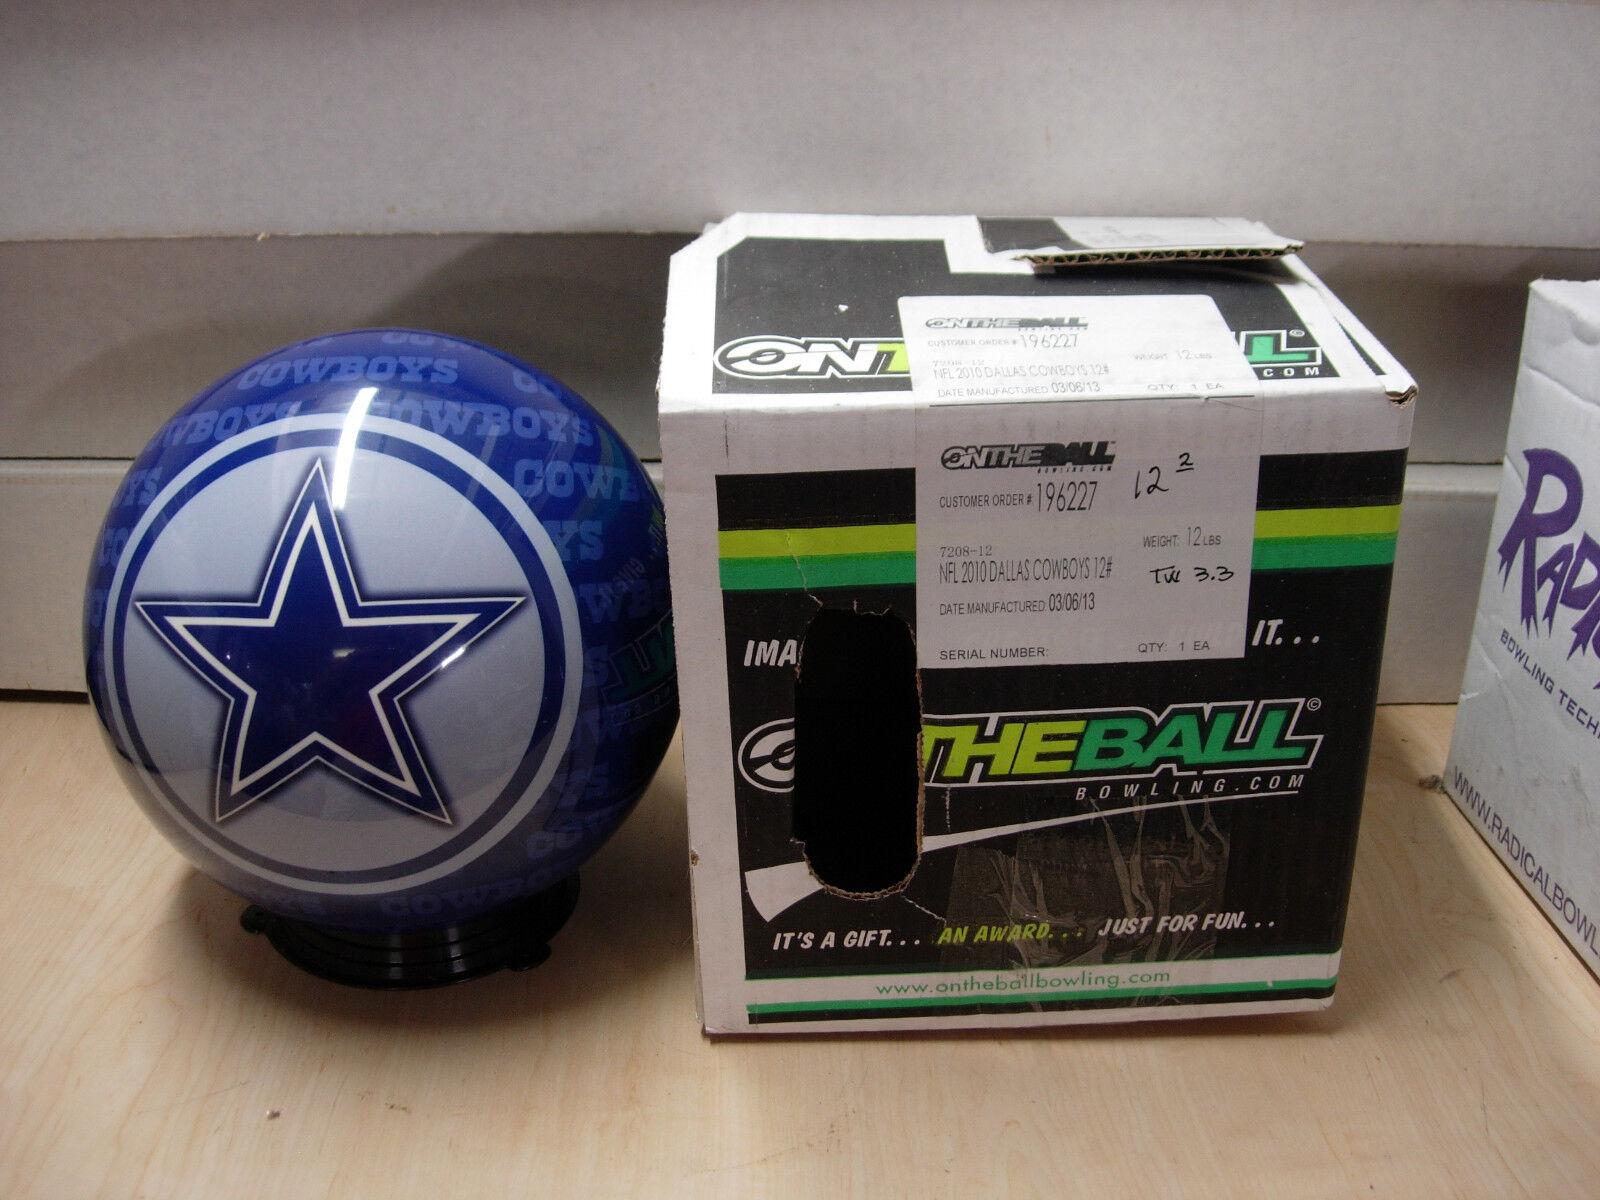 12oz, TW 3.3 Bowling Ball OTBB Viz-A-Ball NFL Retired 2010 Dallas COWBOYS